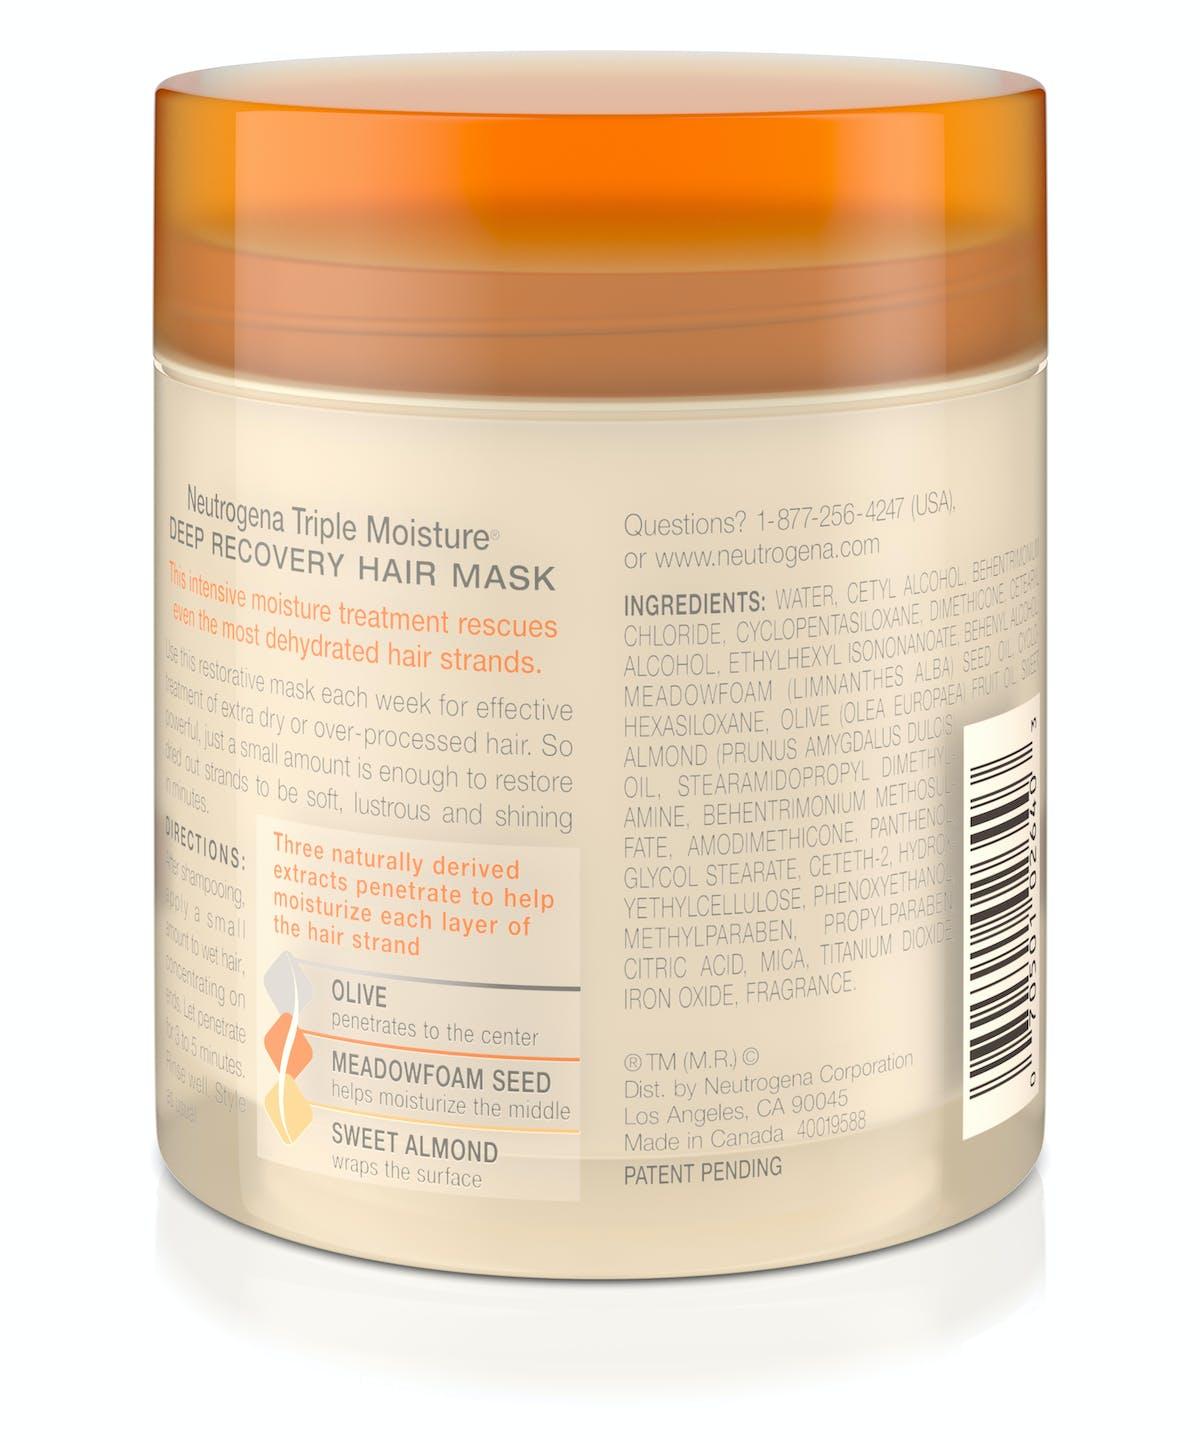 1df272f5a574f4 Neutrogena Triple Moisture® Deep Recovery Hair Mask| Neutrogena®